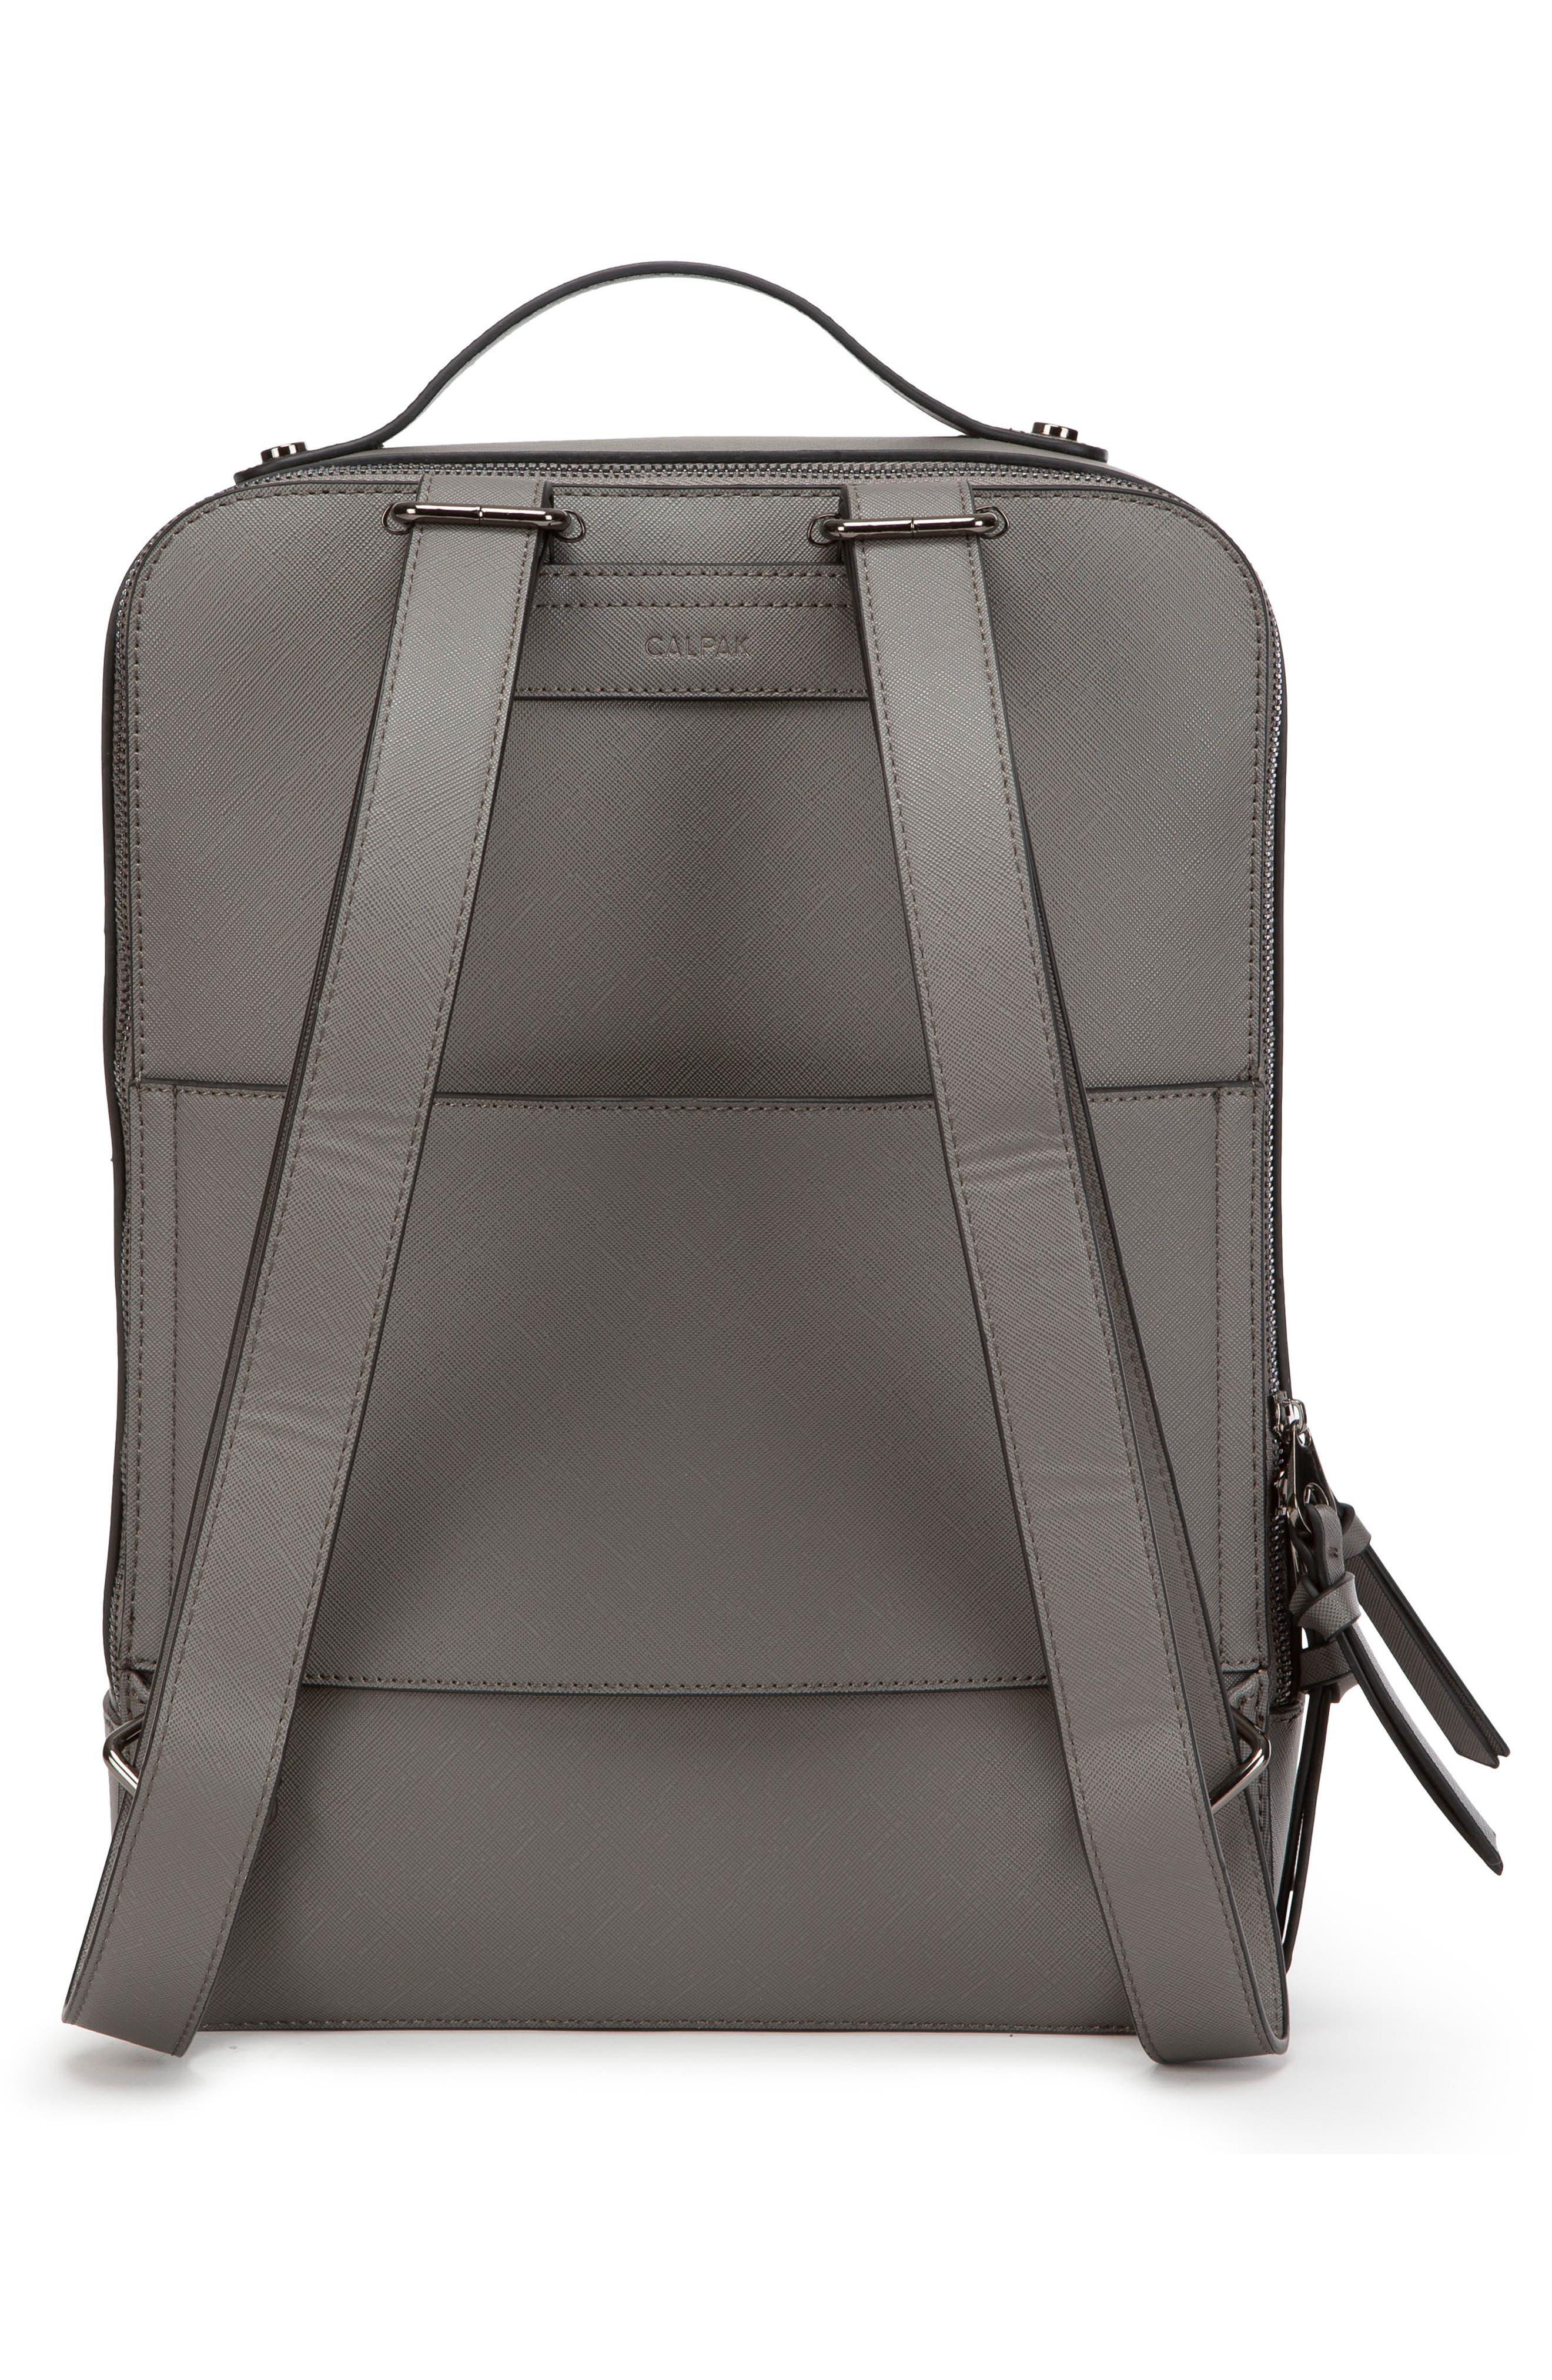 CALPAK, Kaya Faux Leather Laptop Backpack, Alternate thumbnail 2, color, CHARCOAL